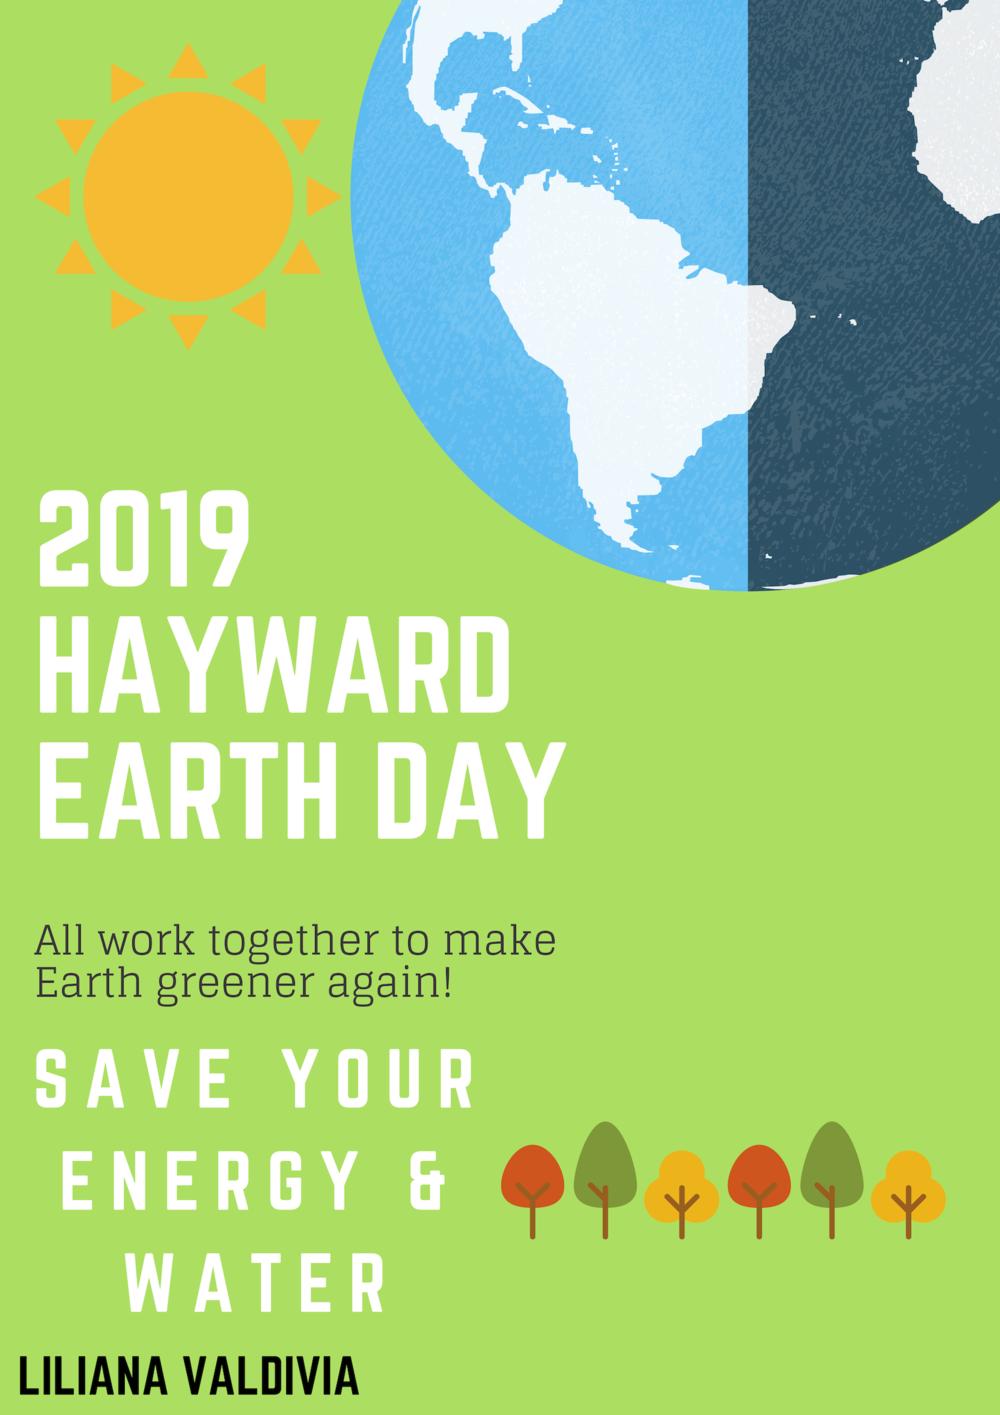 2019 Hayward Earth Day.png